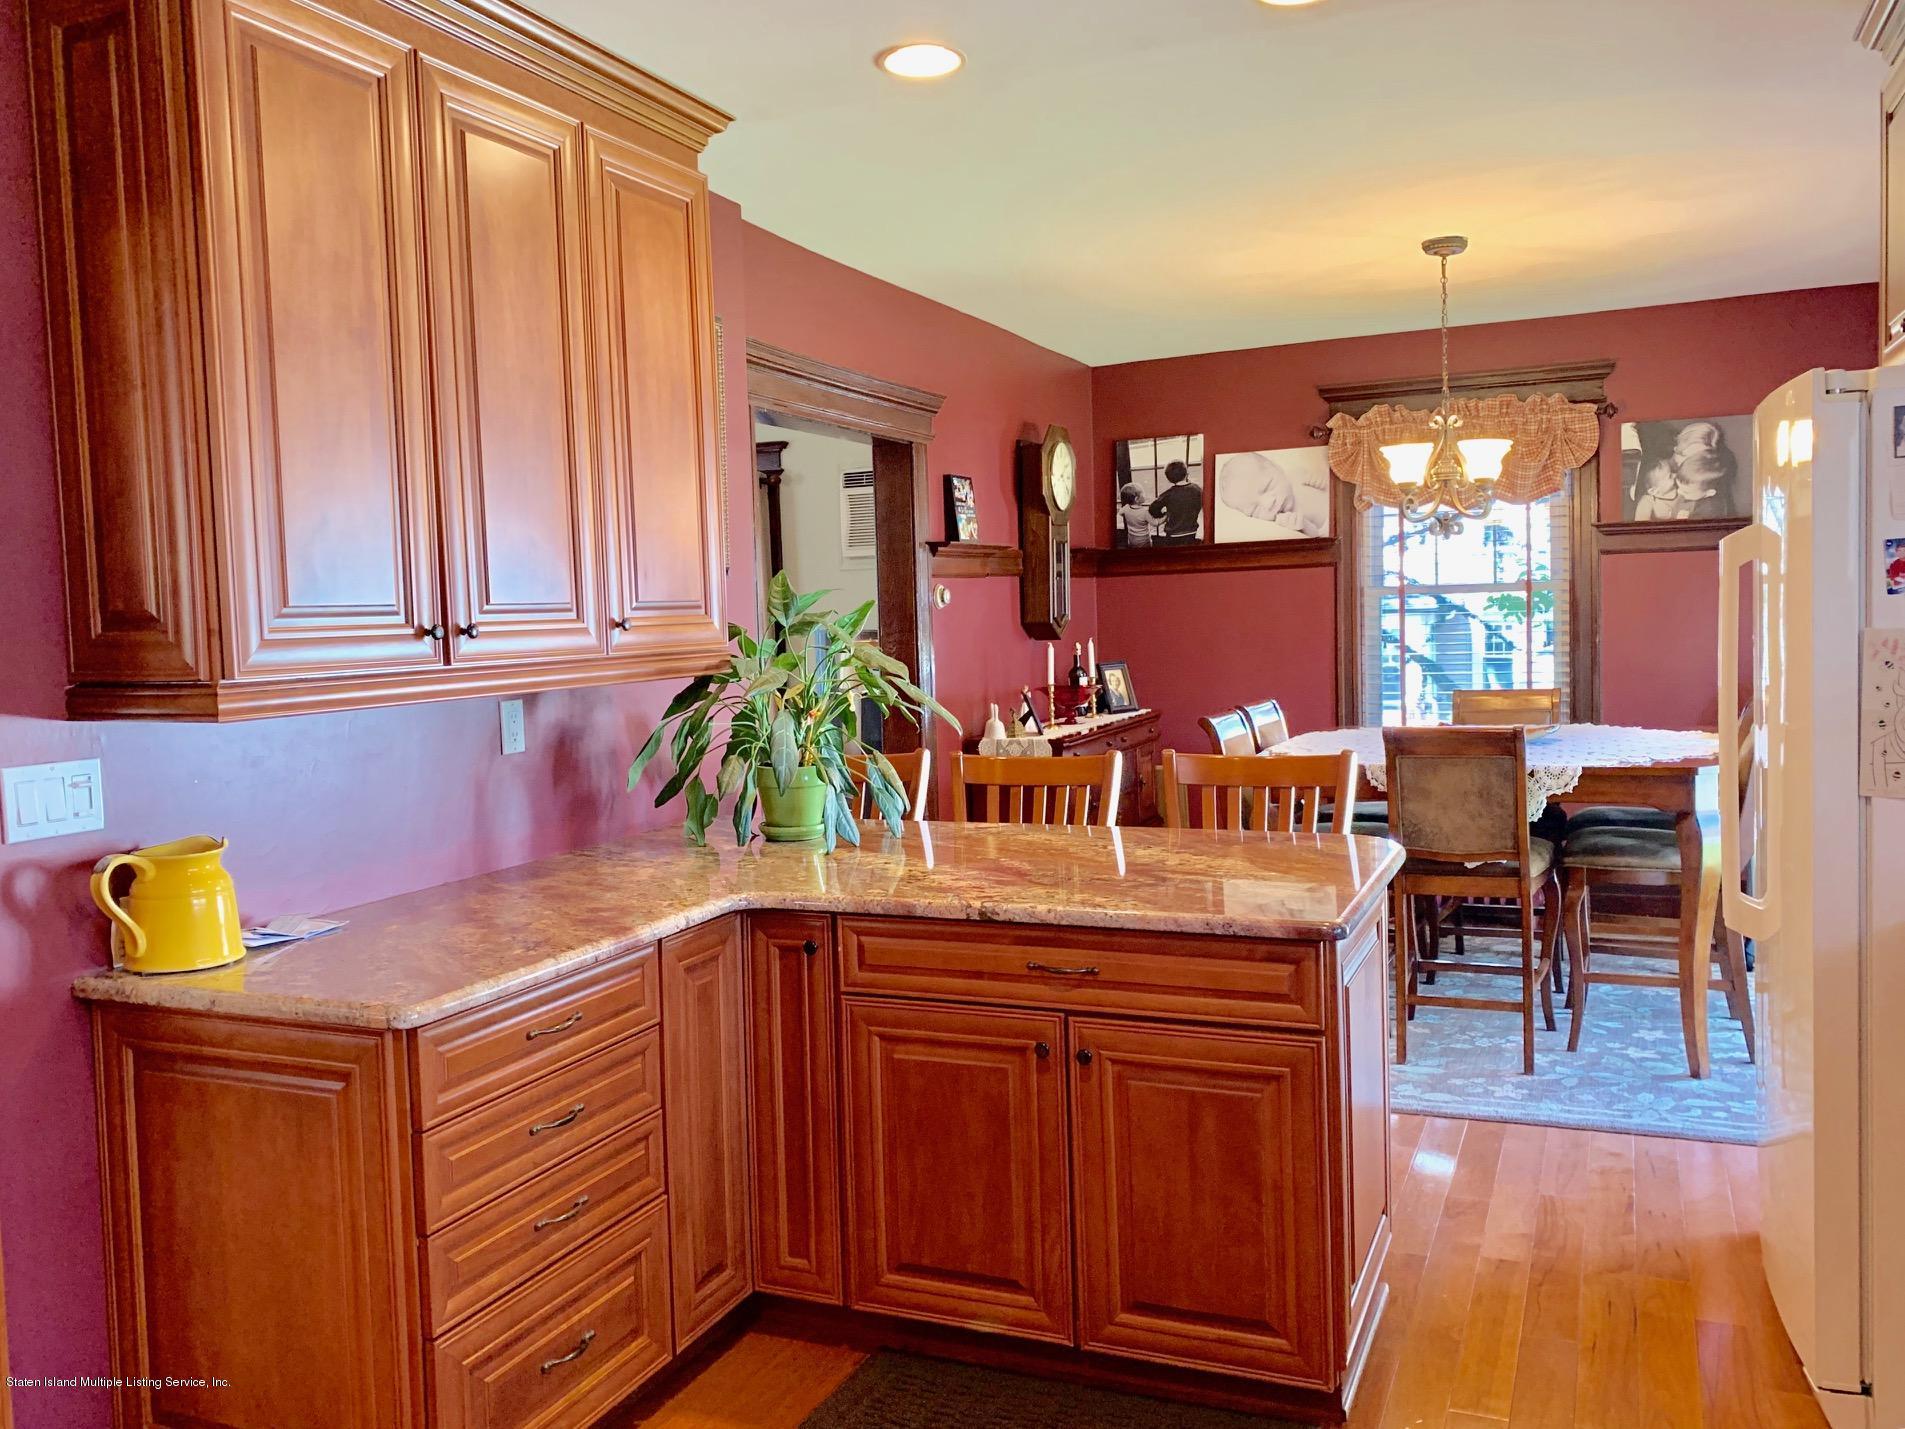 Single Family - Detached 195 Fairview Avenue  Staten Island, NY 10314, MLS-1132423-11